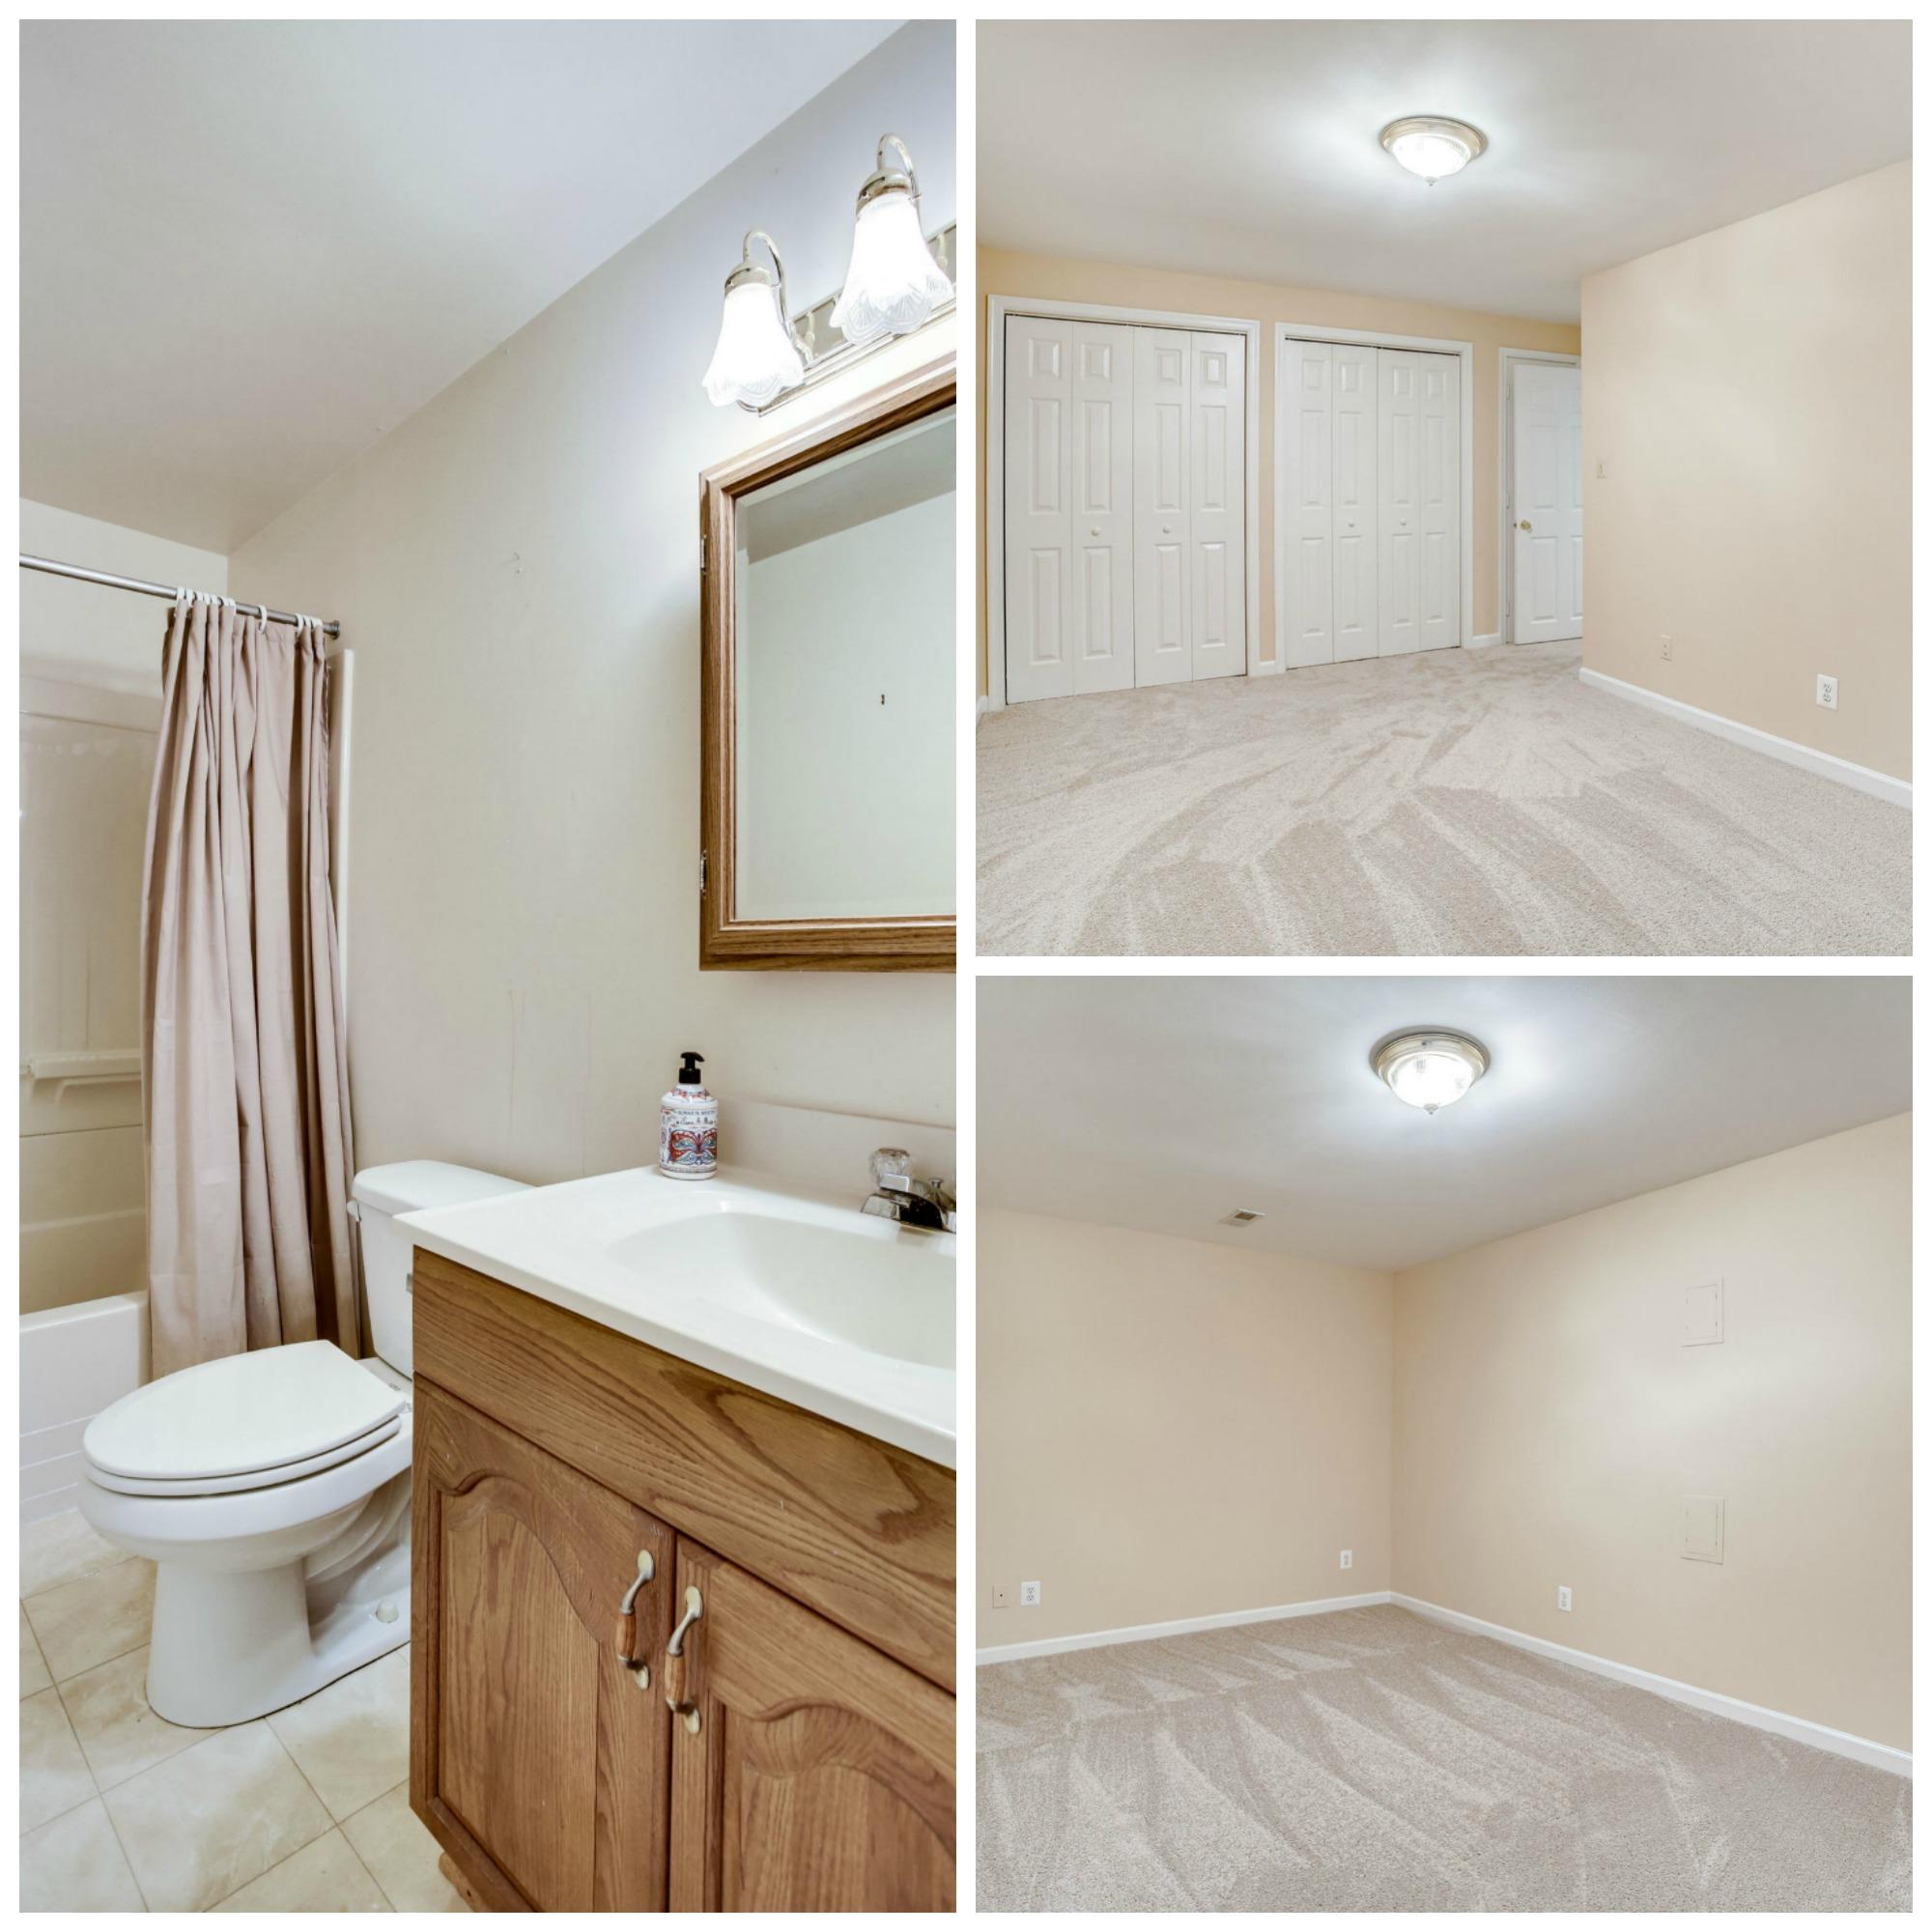 43459 Ridgeview Pl Ashburn Farm - Lower Level Bathroom and Den